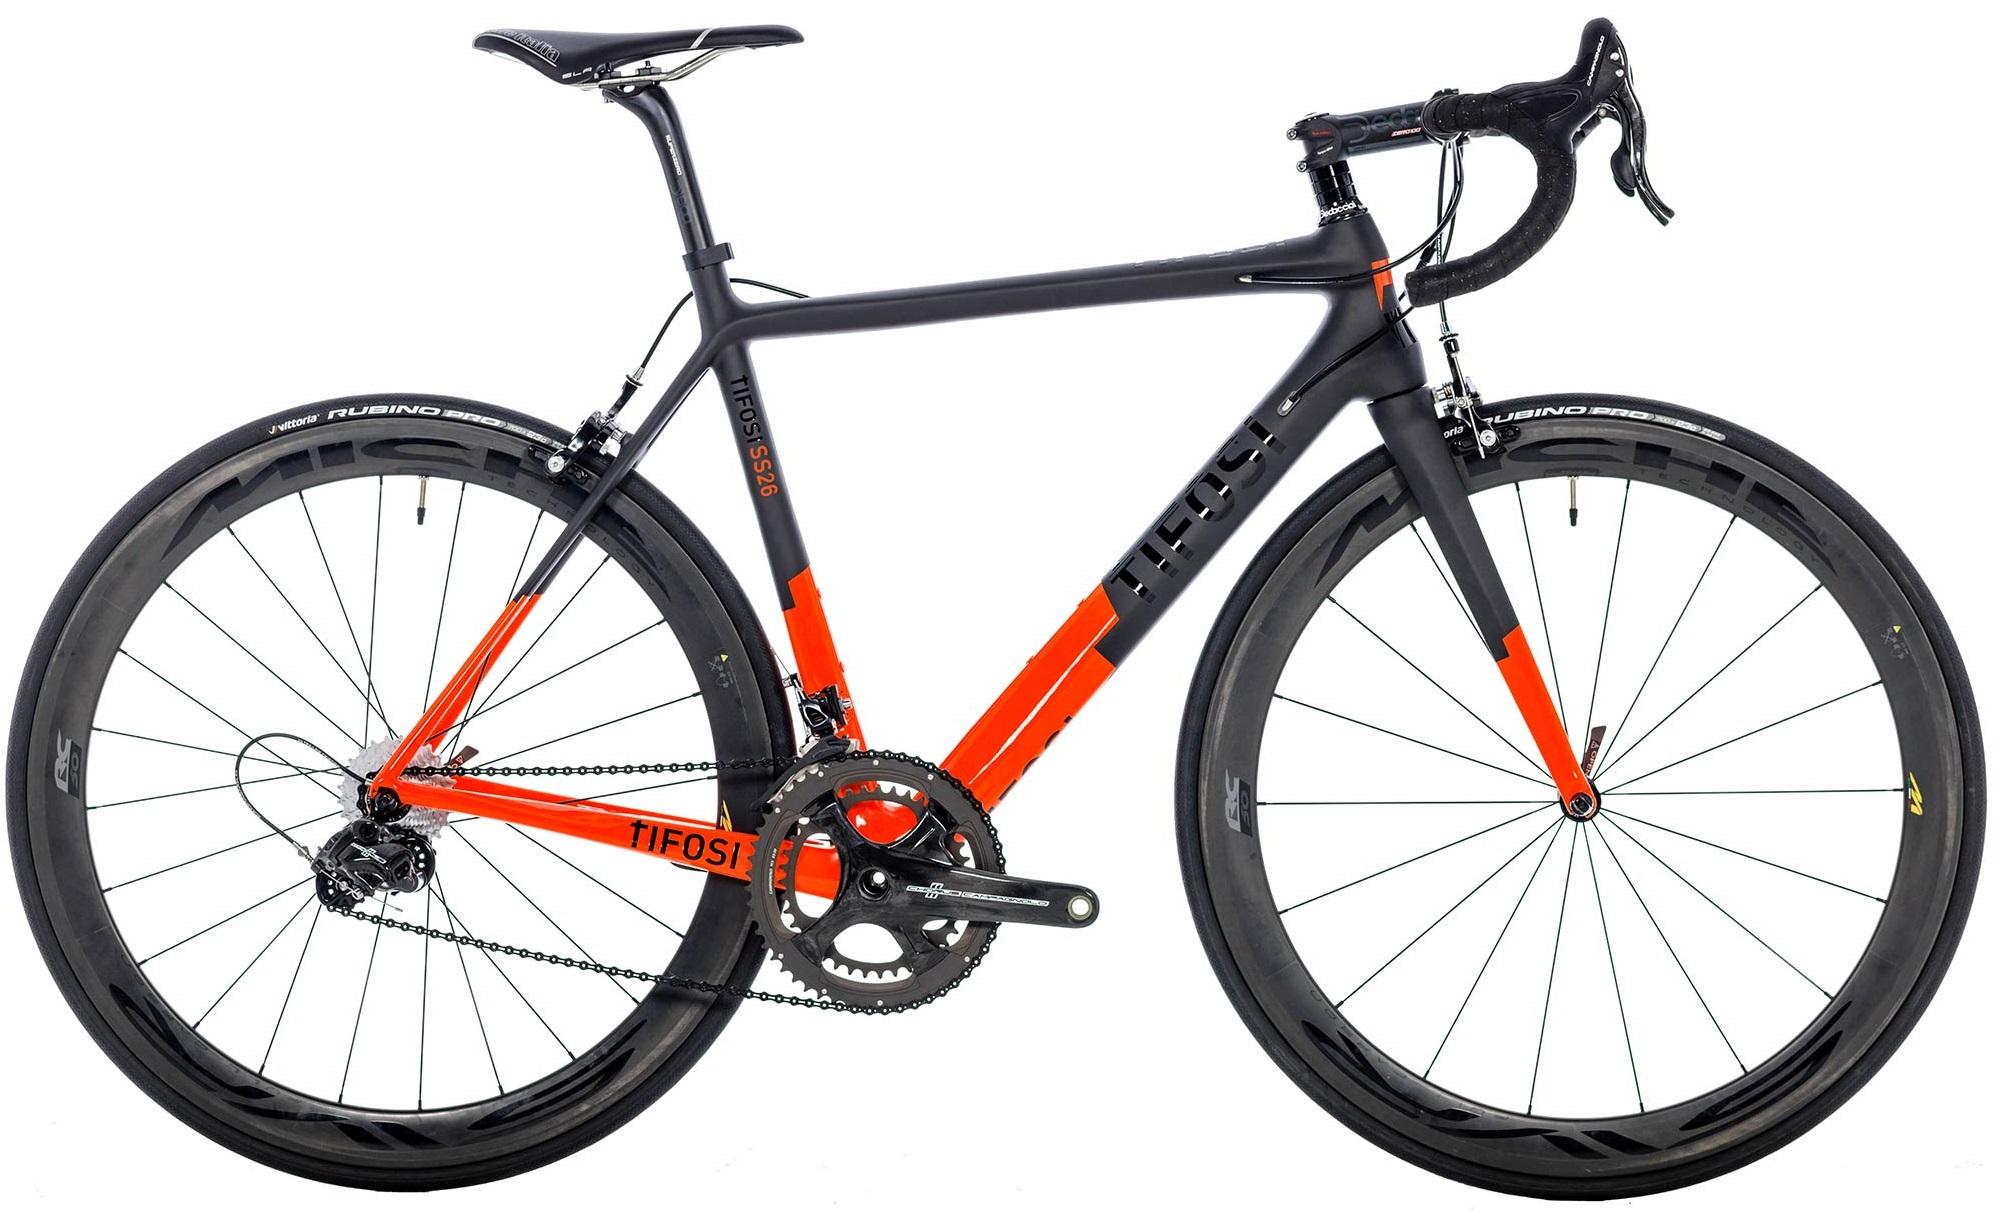 2016 Tifosi SS26 campy chorus orange blackneuroticarnutz2016 Tifosi SS26 campy chorus orange black2016 Stevens ventoux_racing_orange dura ace